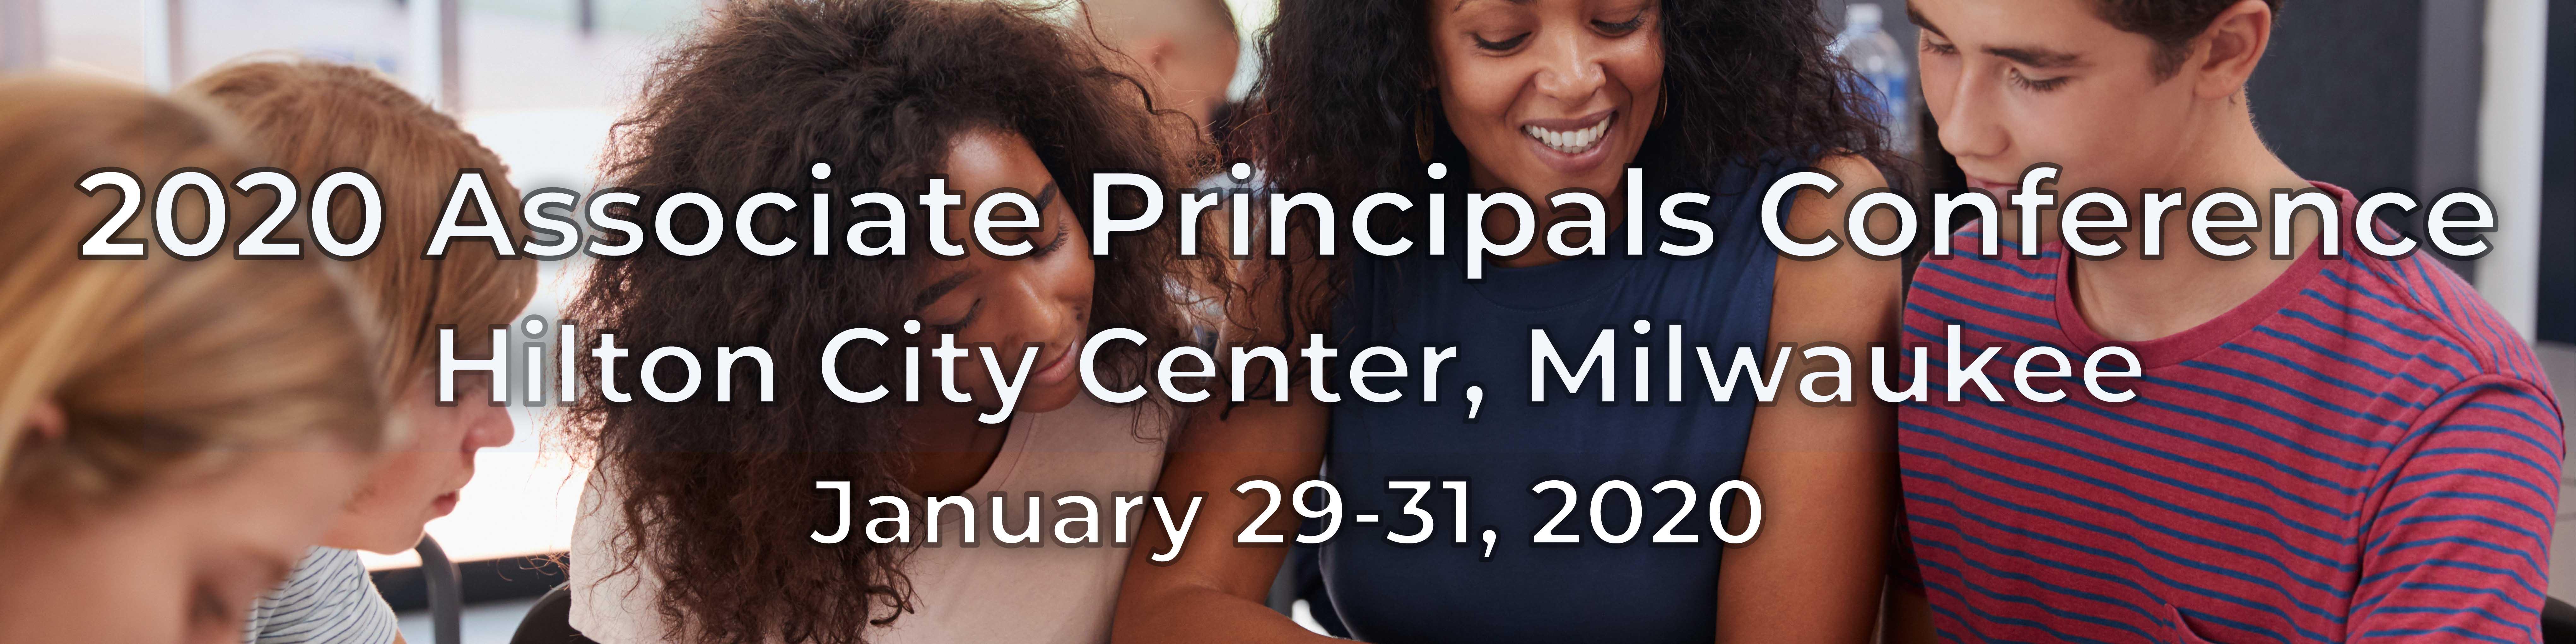 Associate Principals Conference